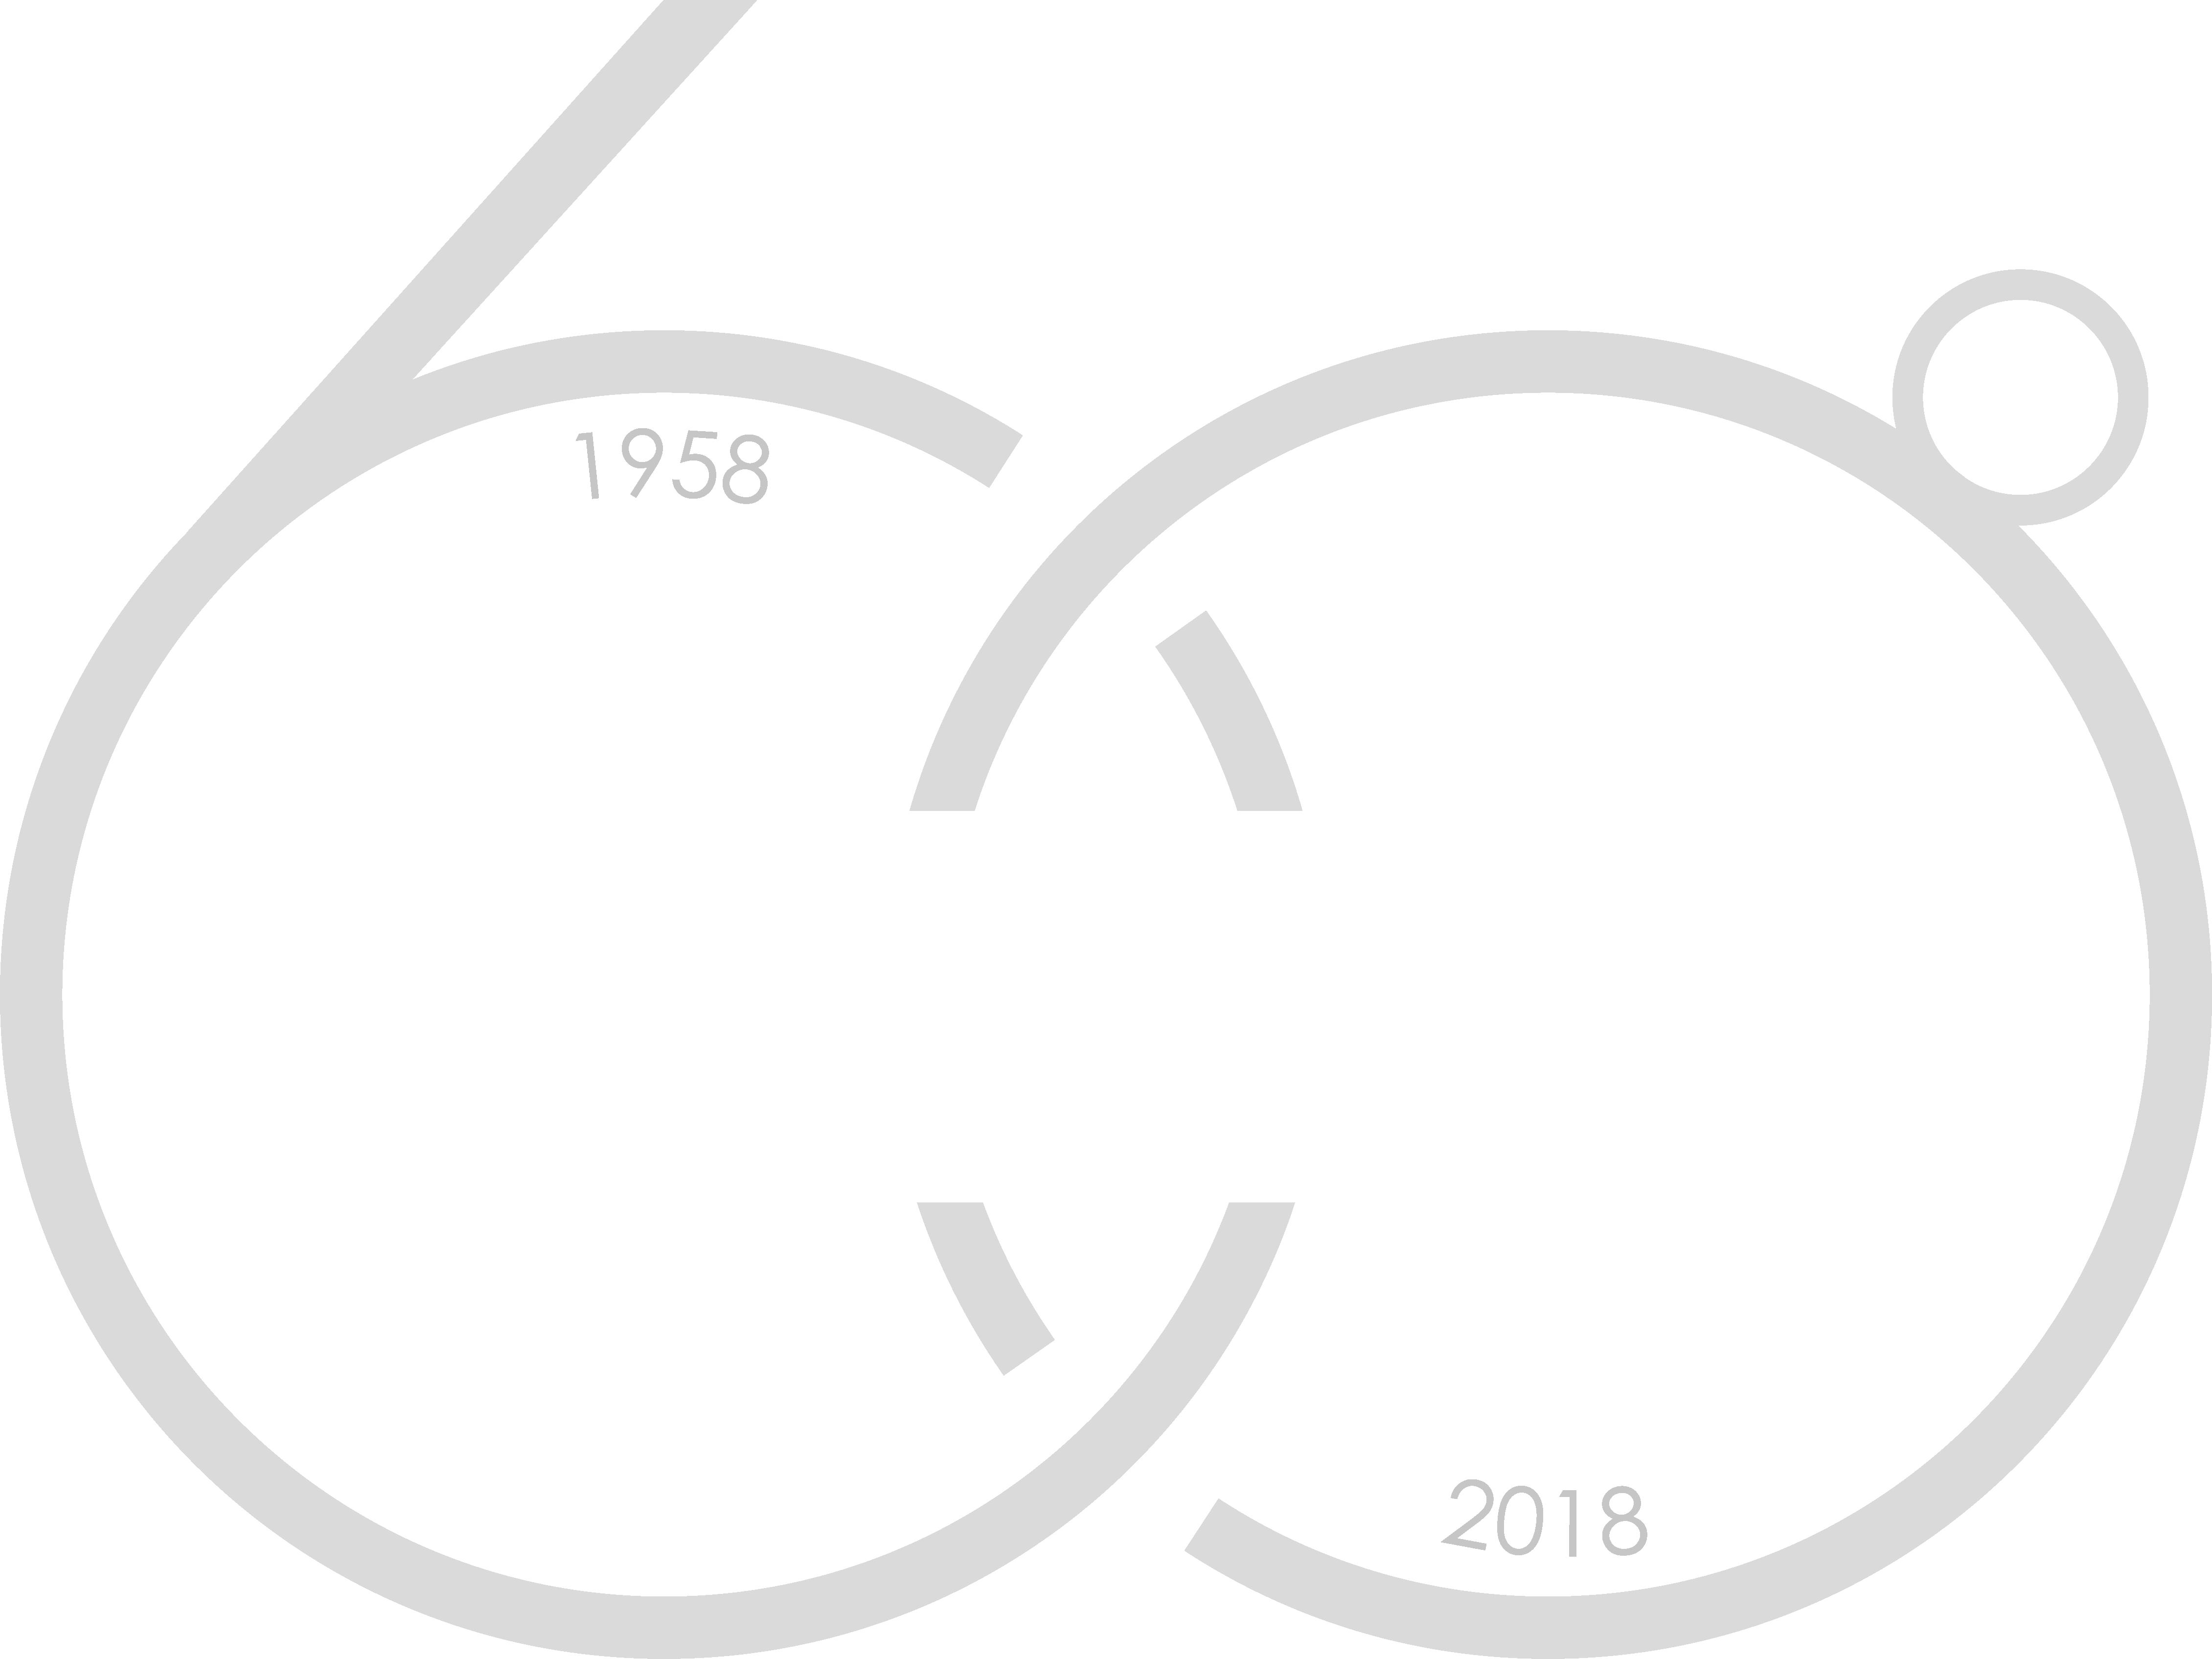 FRATTINI Rubinetterie - 1958-2018 - 60th Anniversary